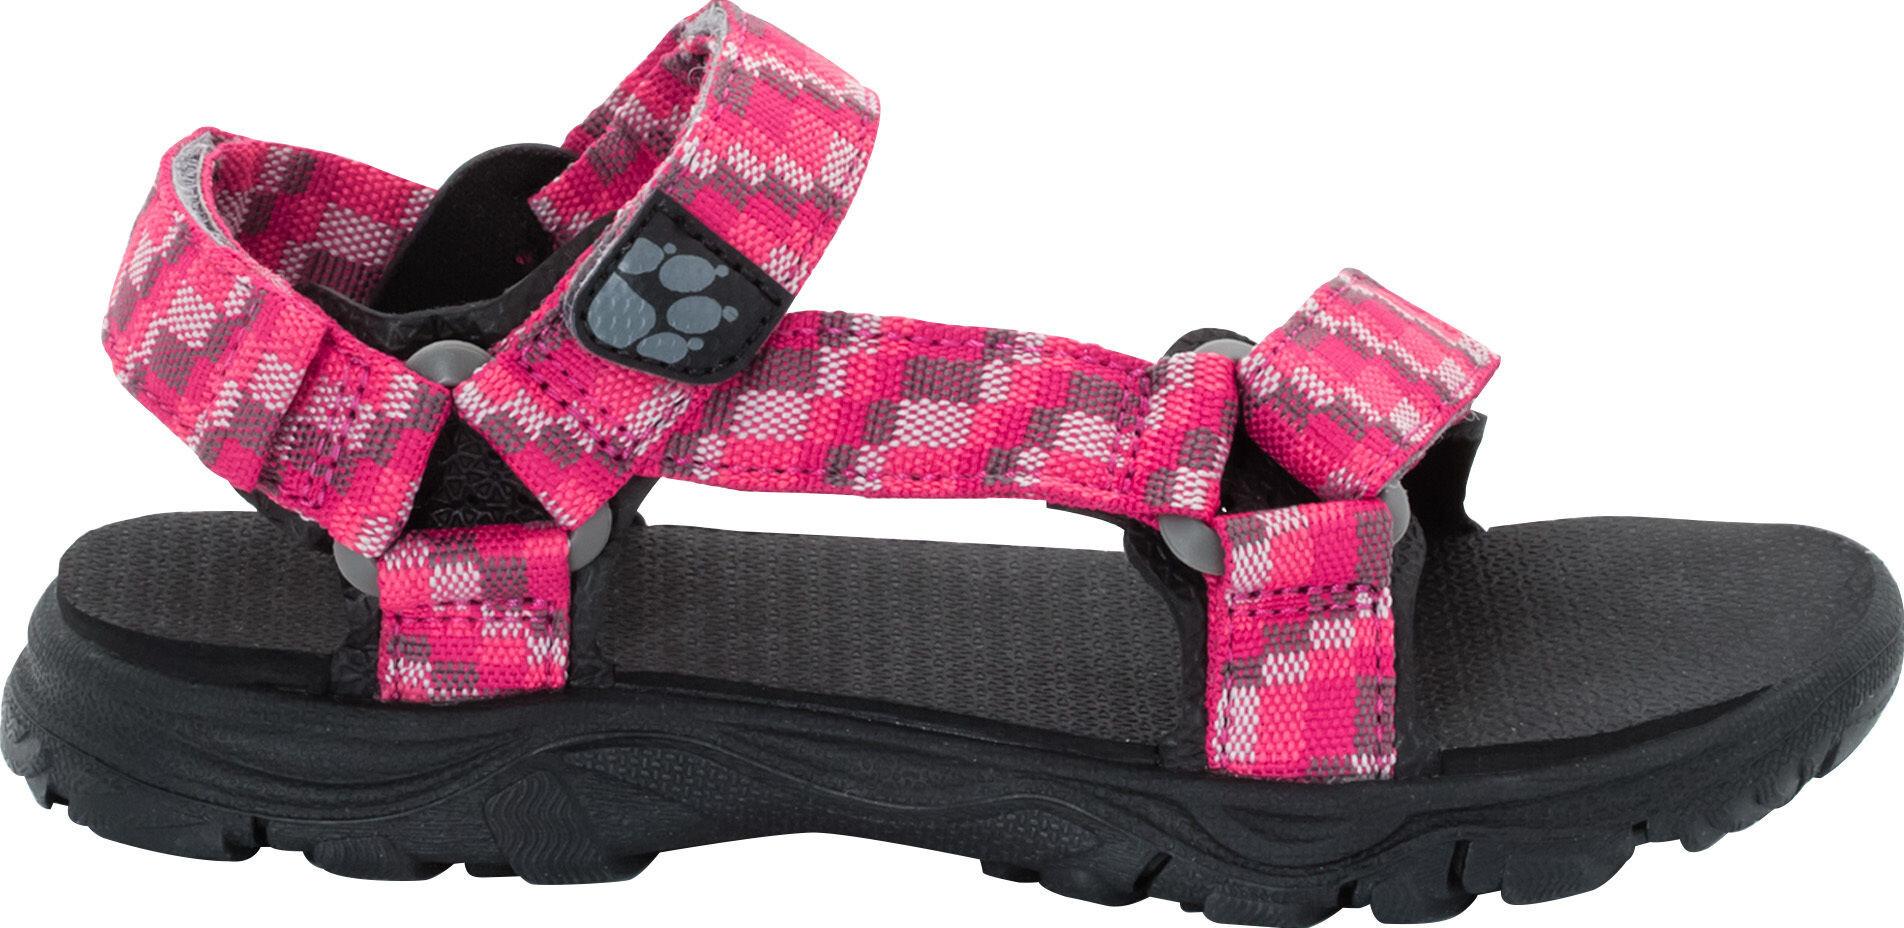 Jack Wolfskin Seven Seas 2 Sandalen Mädchen tropic pink